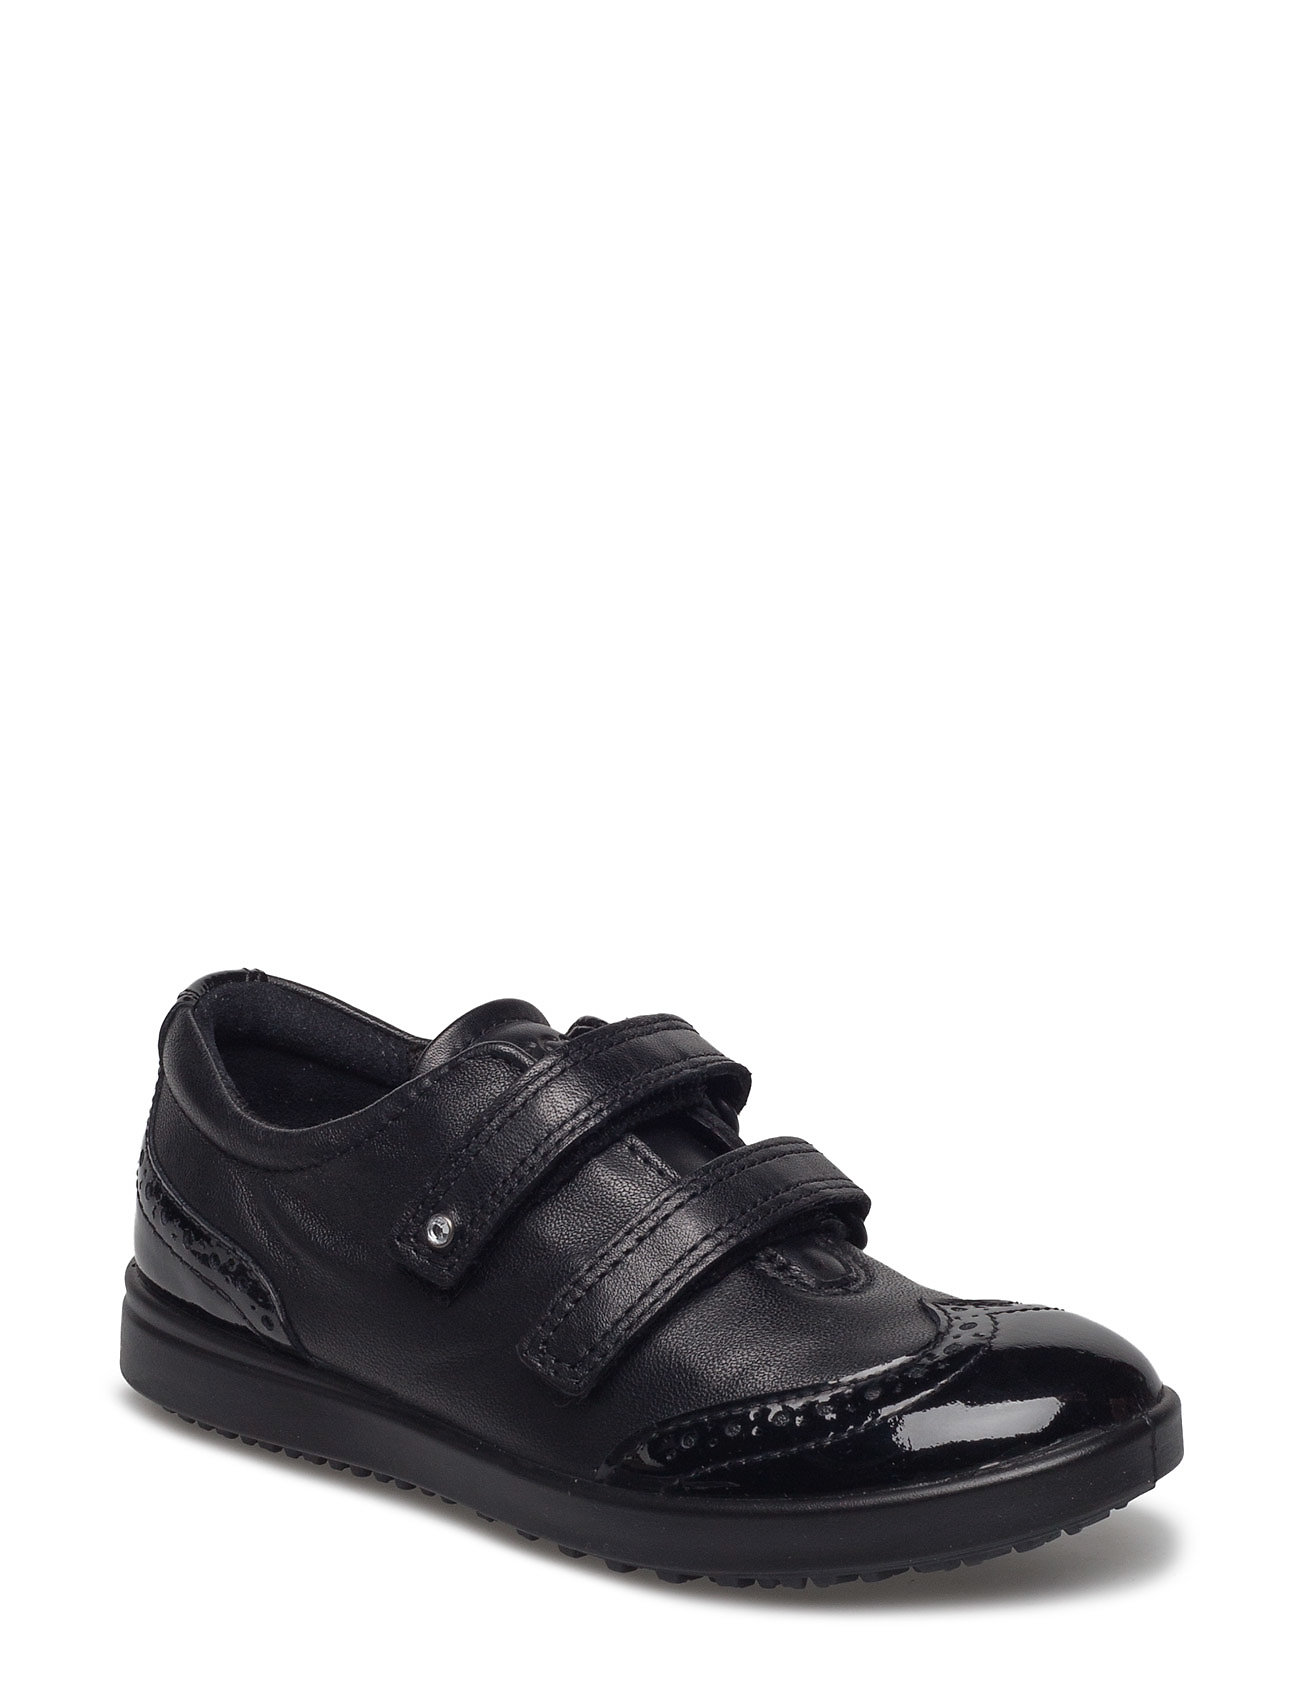 Elli ECCO Sko & Sneakers til Børn i